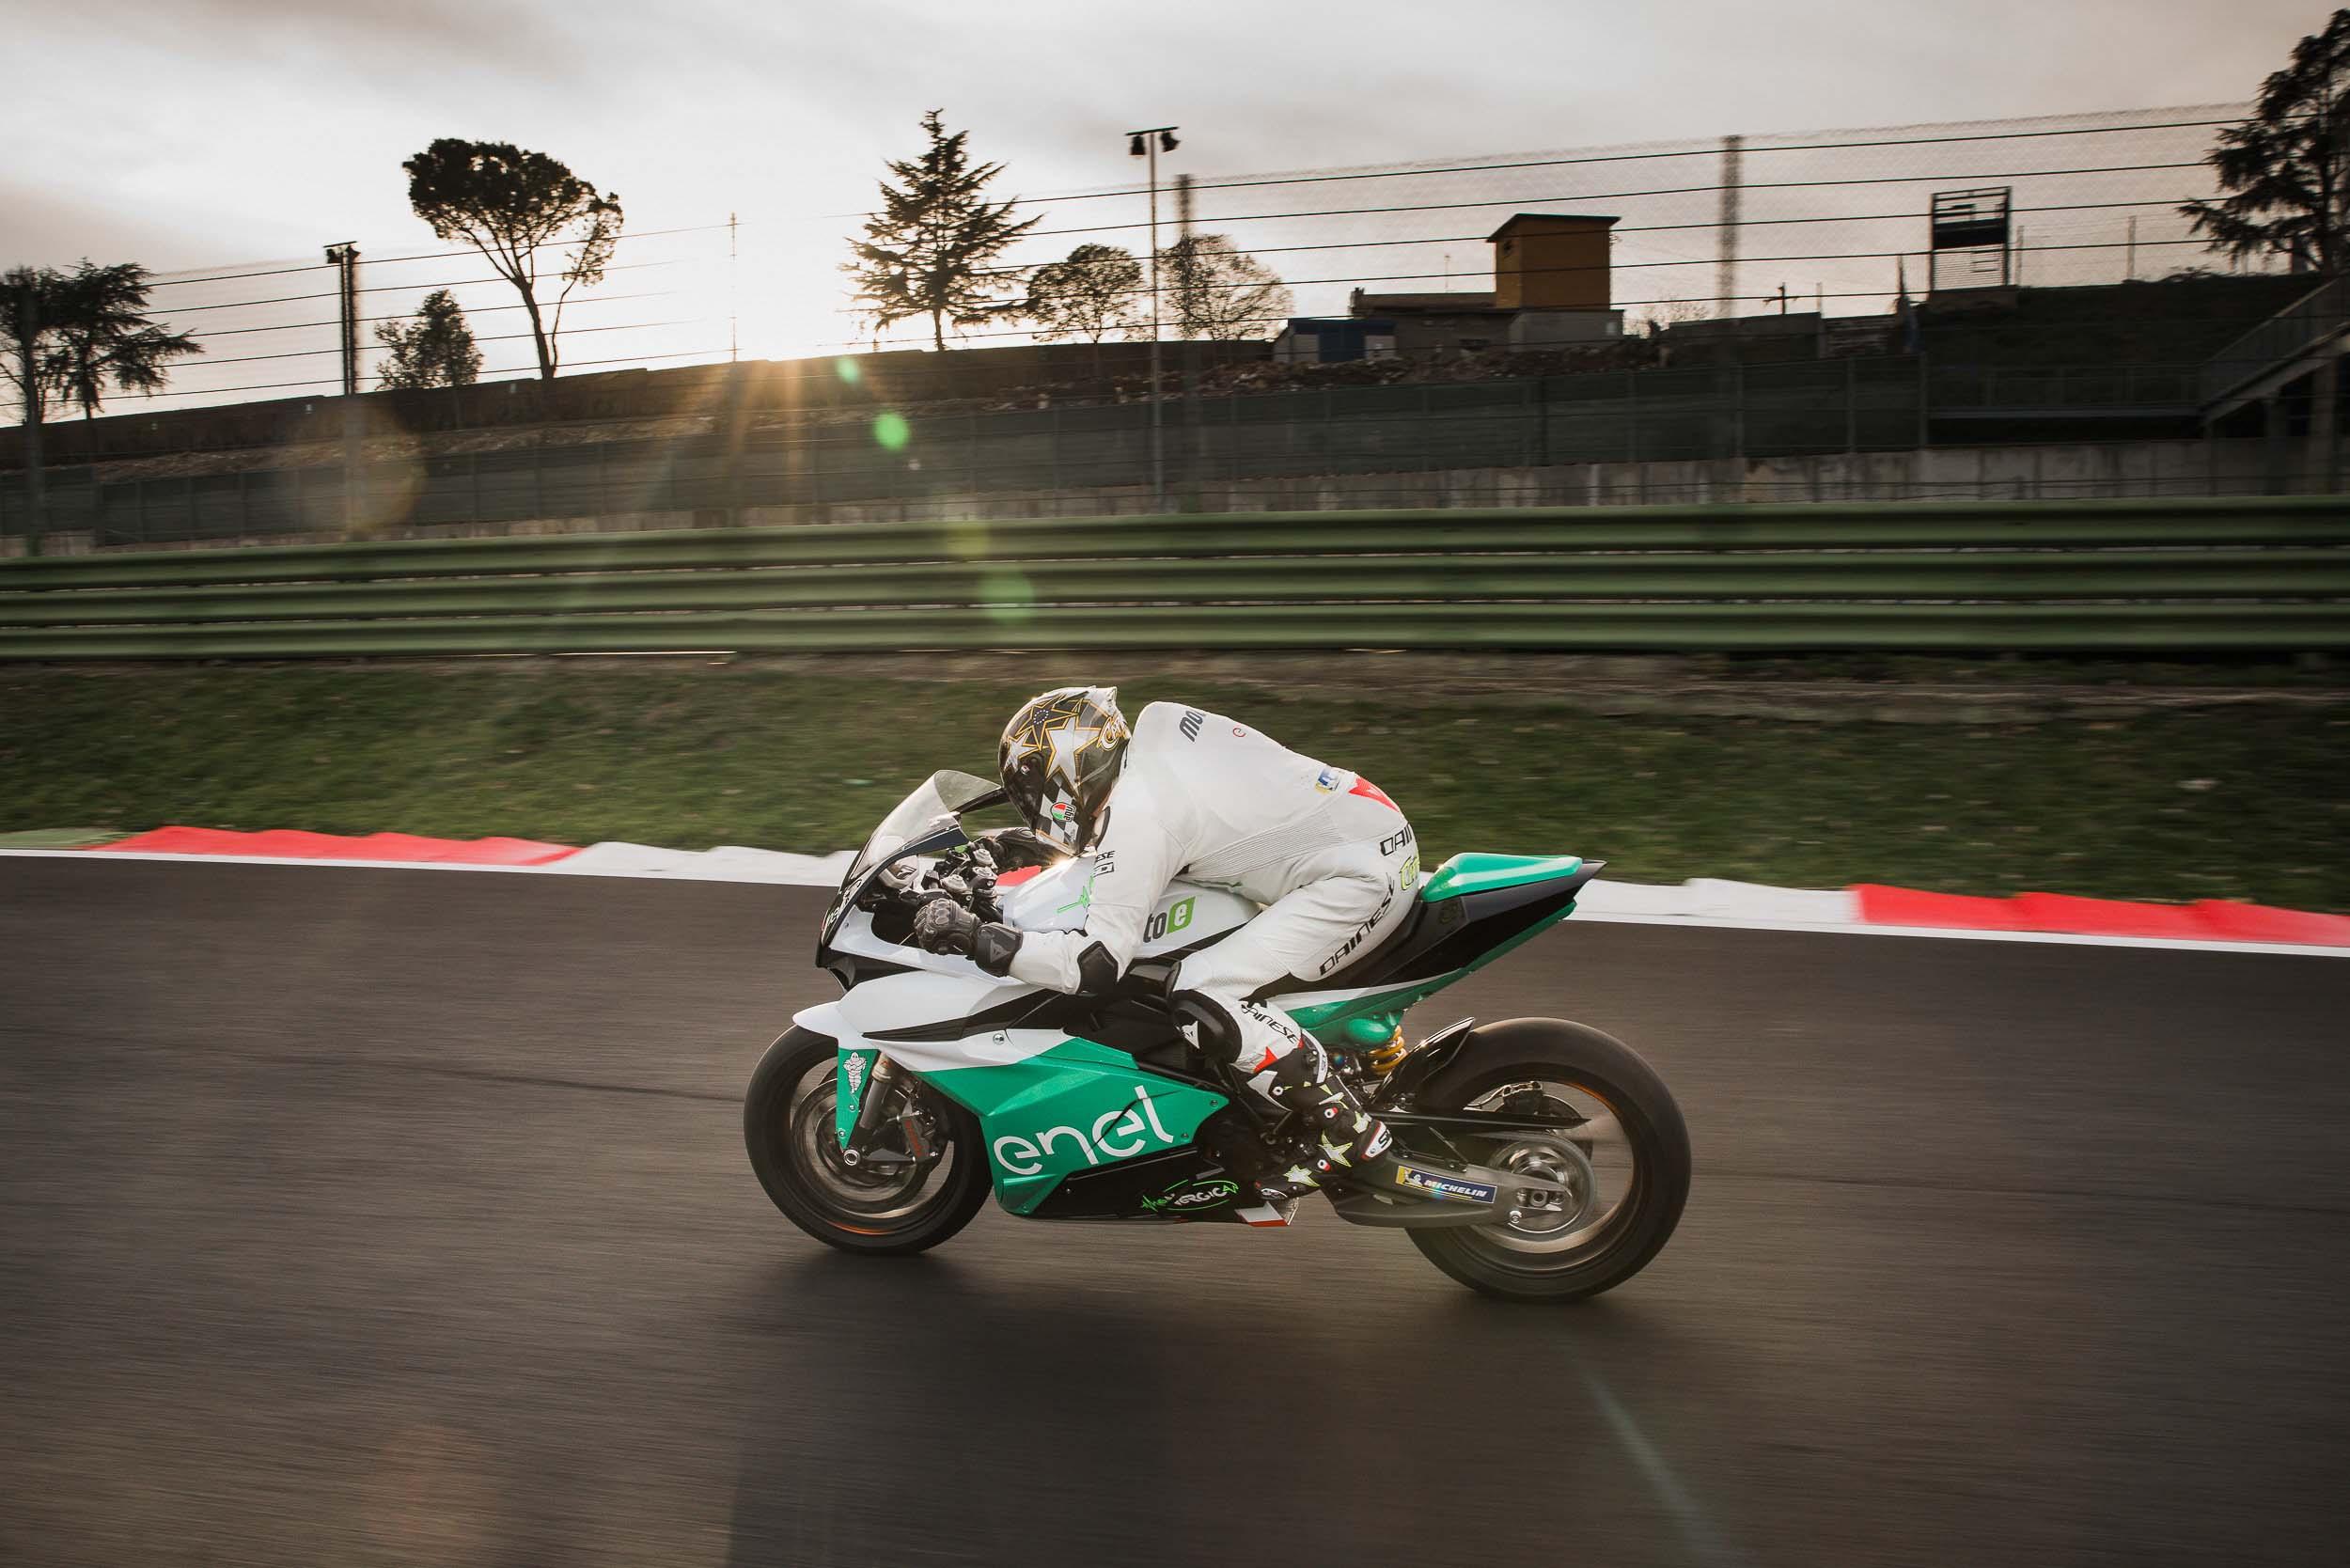 La sportive verte du futur - Page 16 FIM-Enel-MotoE-World-Cup-Energica-Ego-race-bike-02